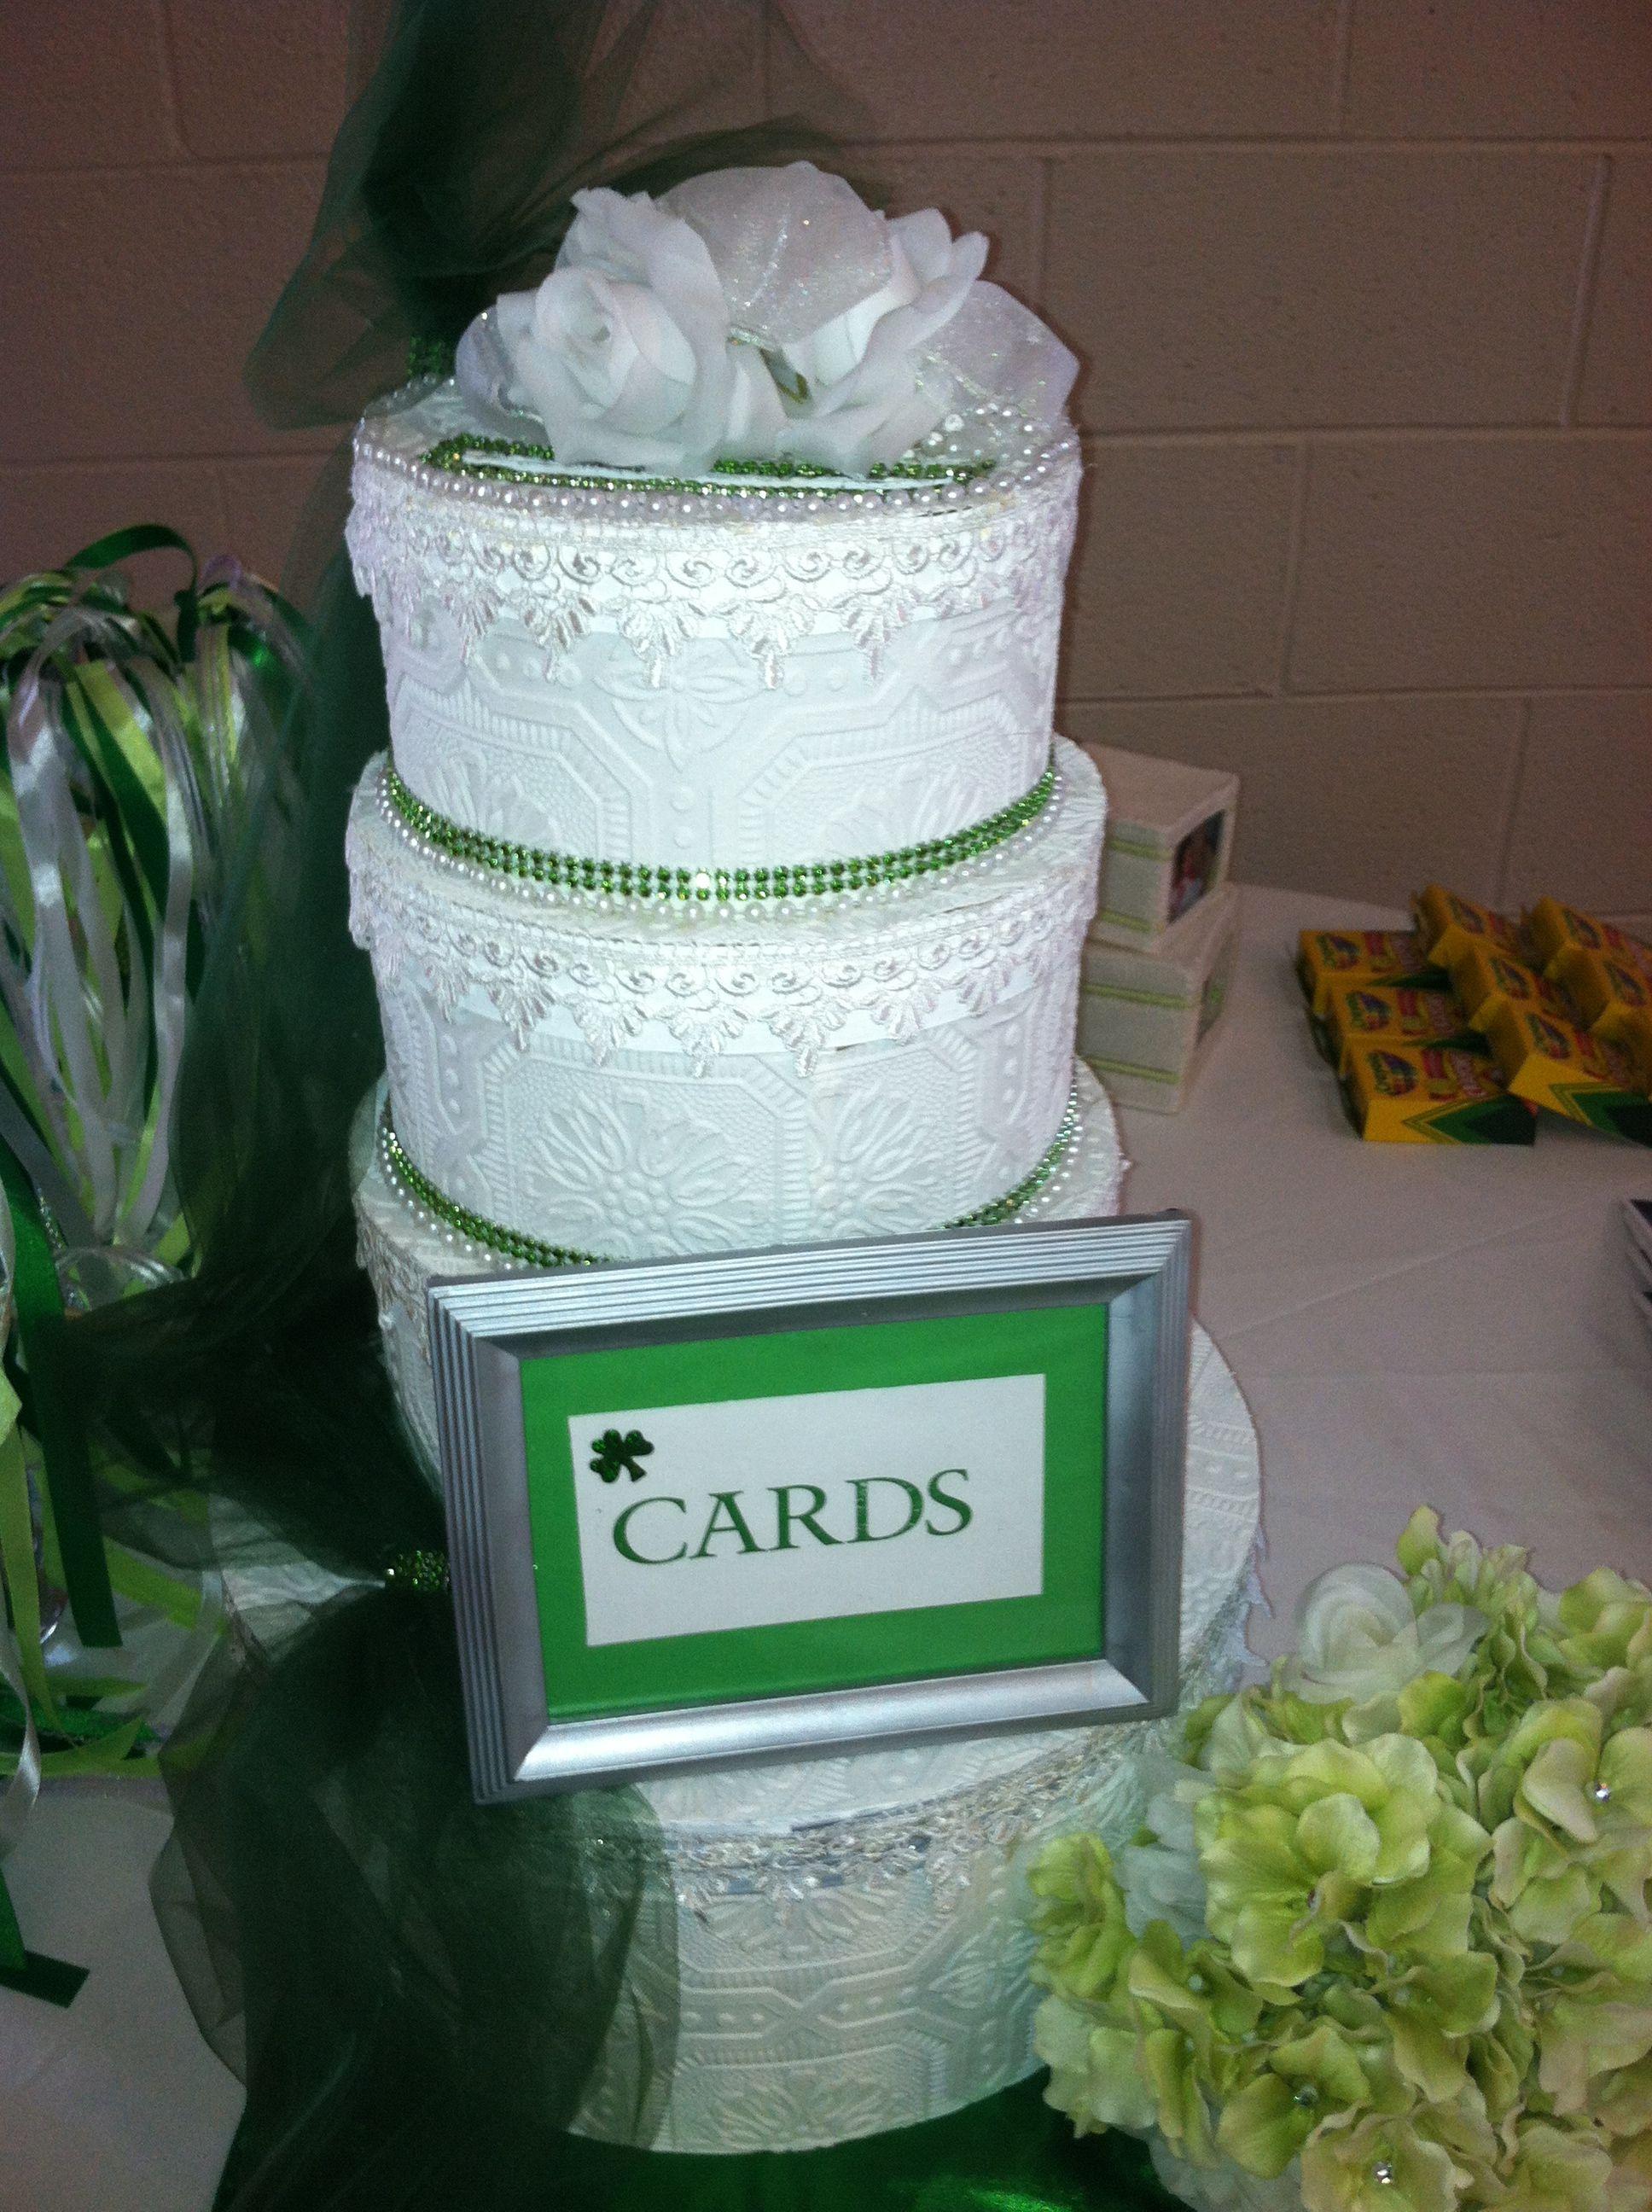 Card Box For Irish Wedding: Card Box Wedding Cake Ideas At Websimilar.org